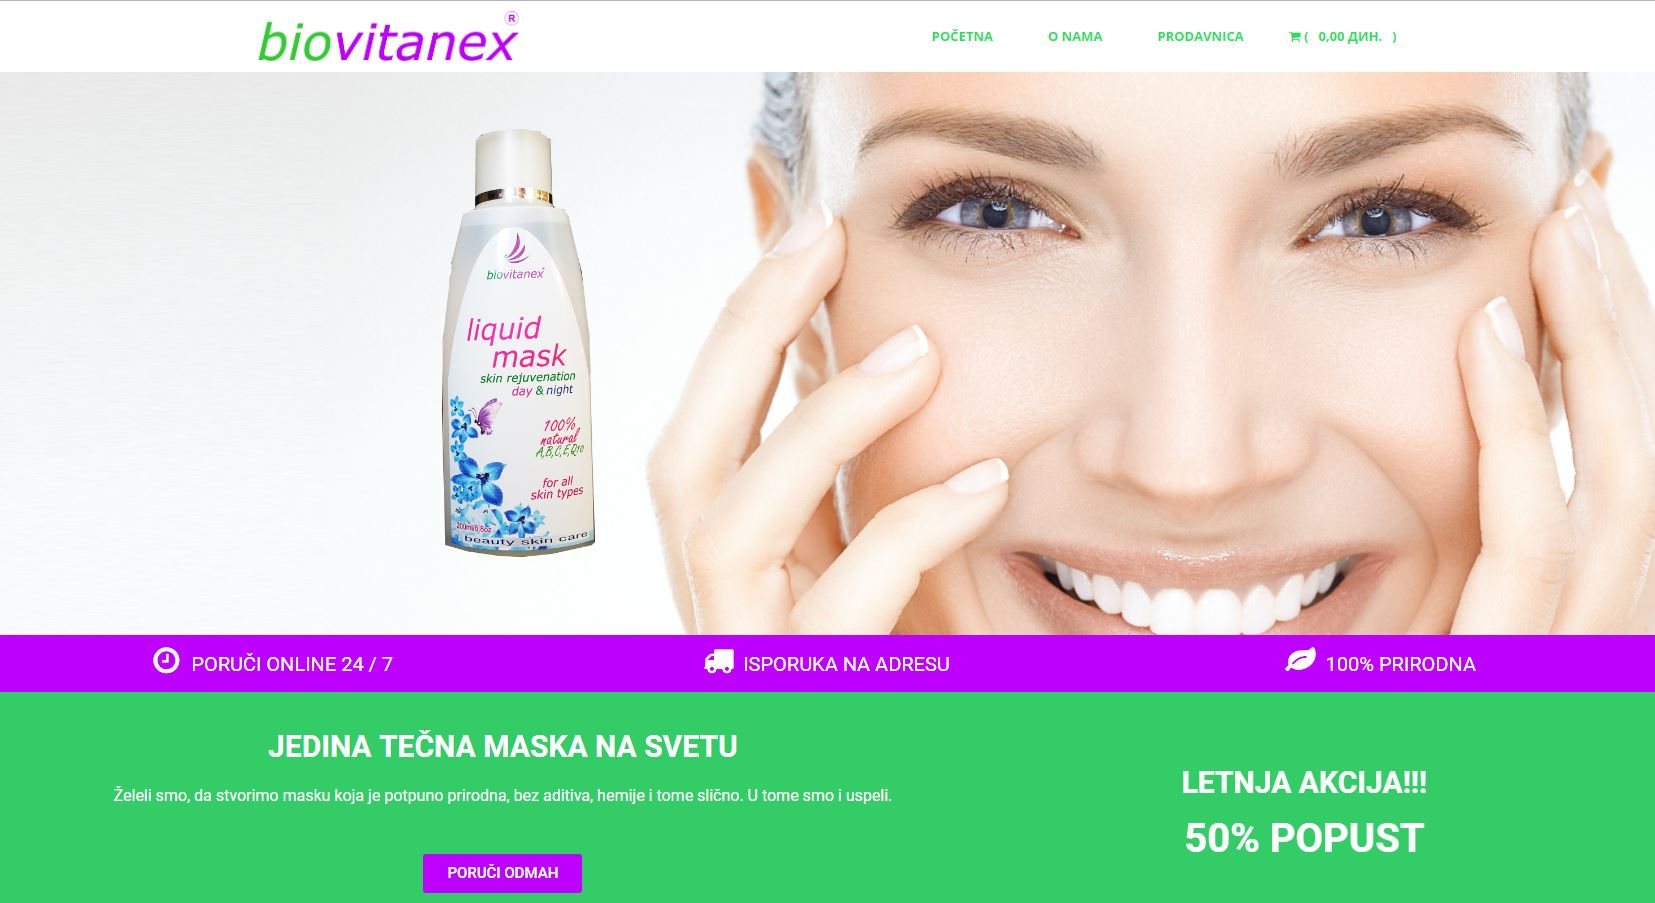 Biovitanex online prodavnica | Tečna maska za lice